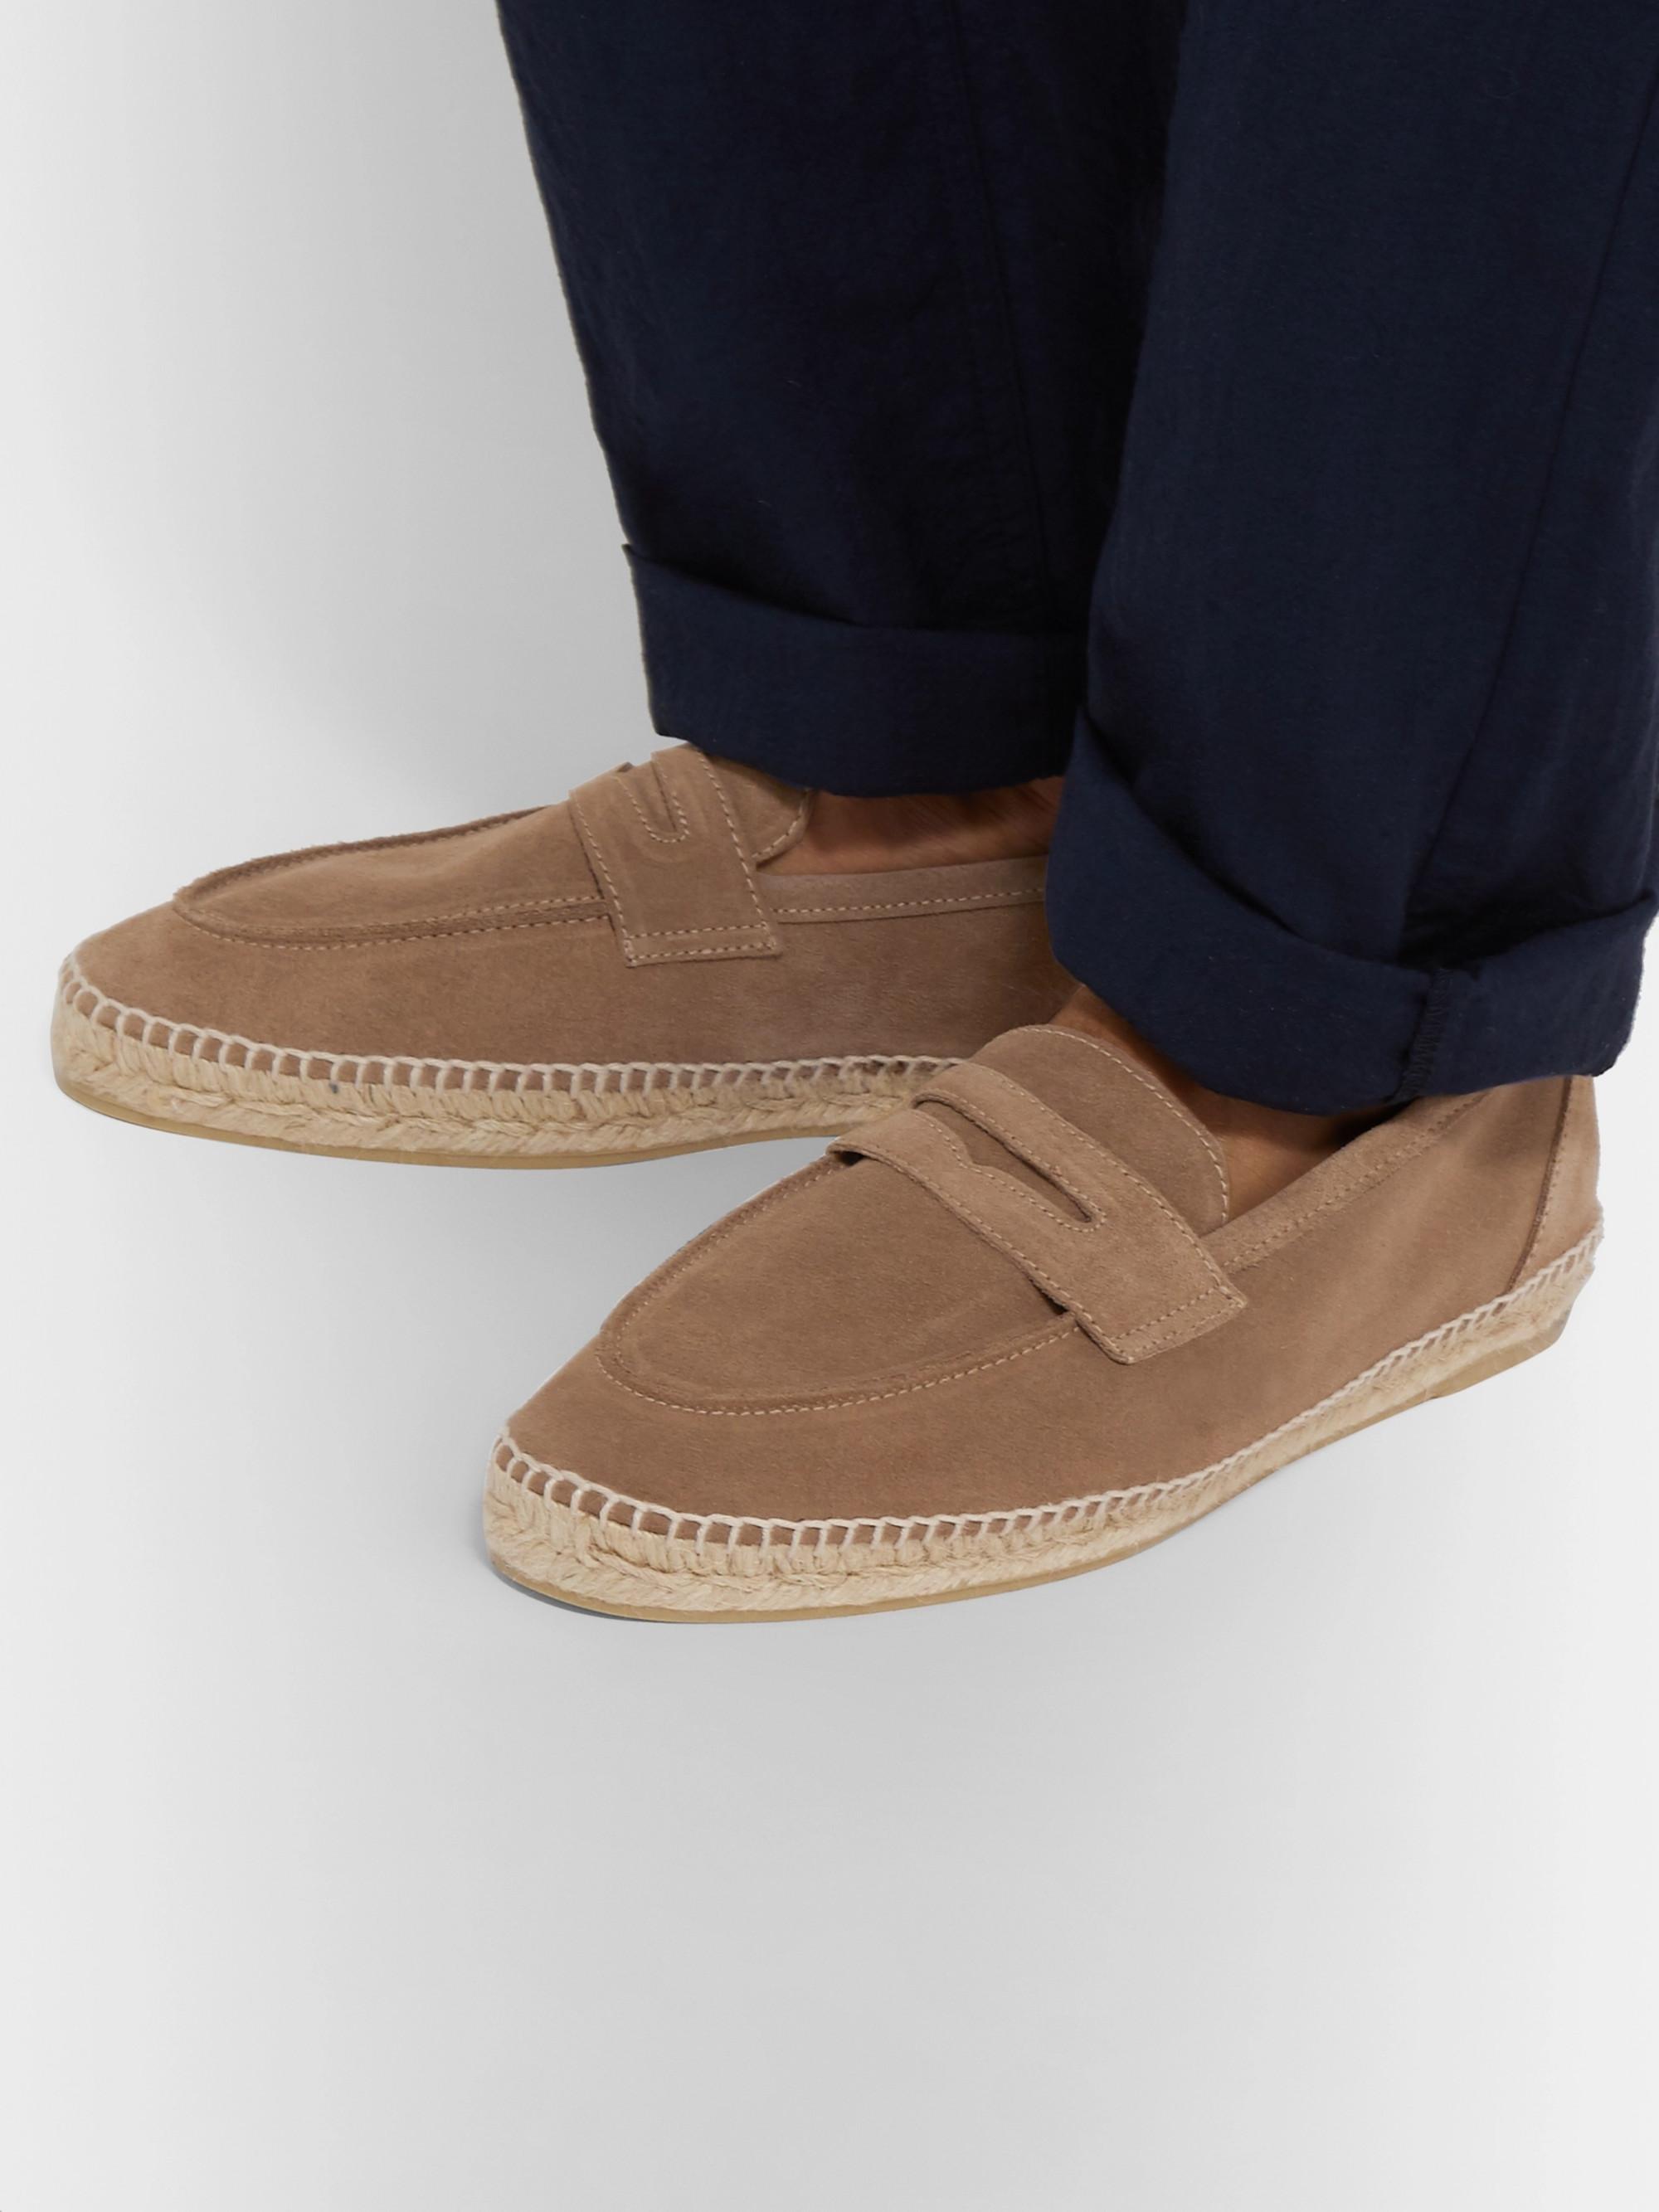 30ffe95e4 Men's Espadrilles | Designer Shoes | MR PORTER